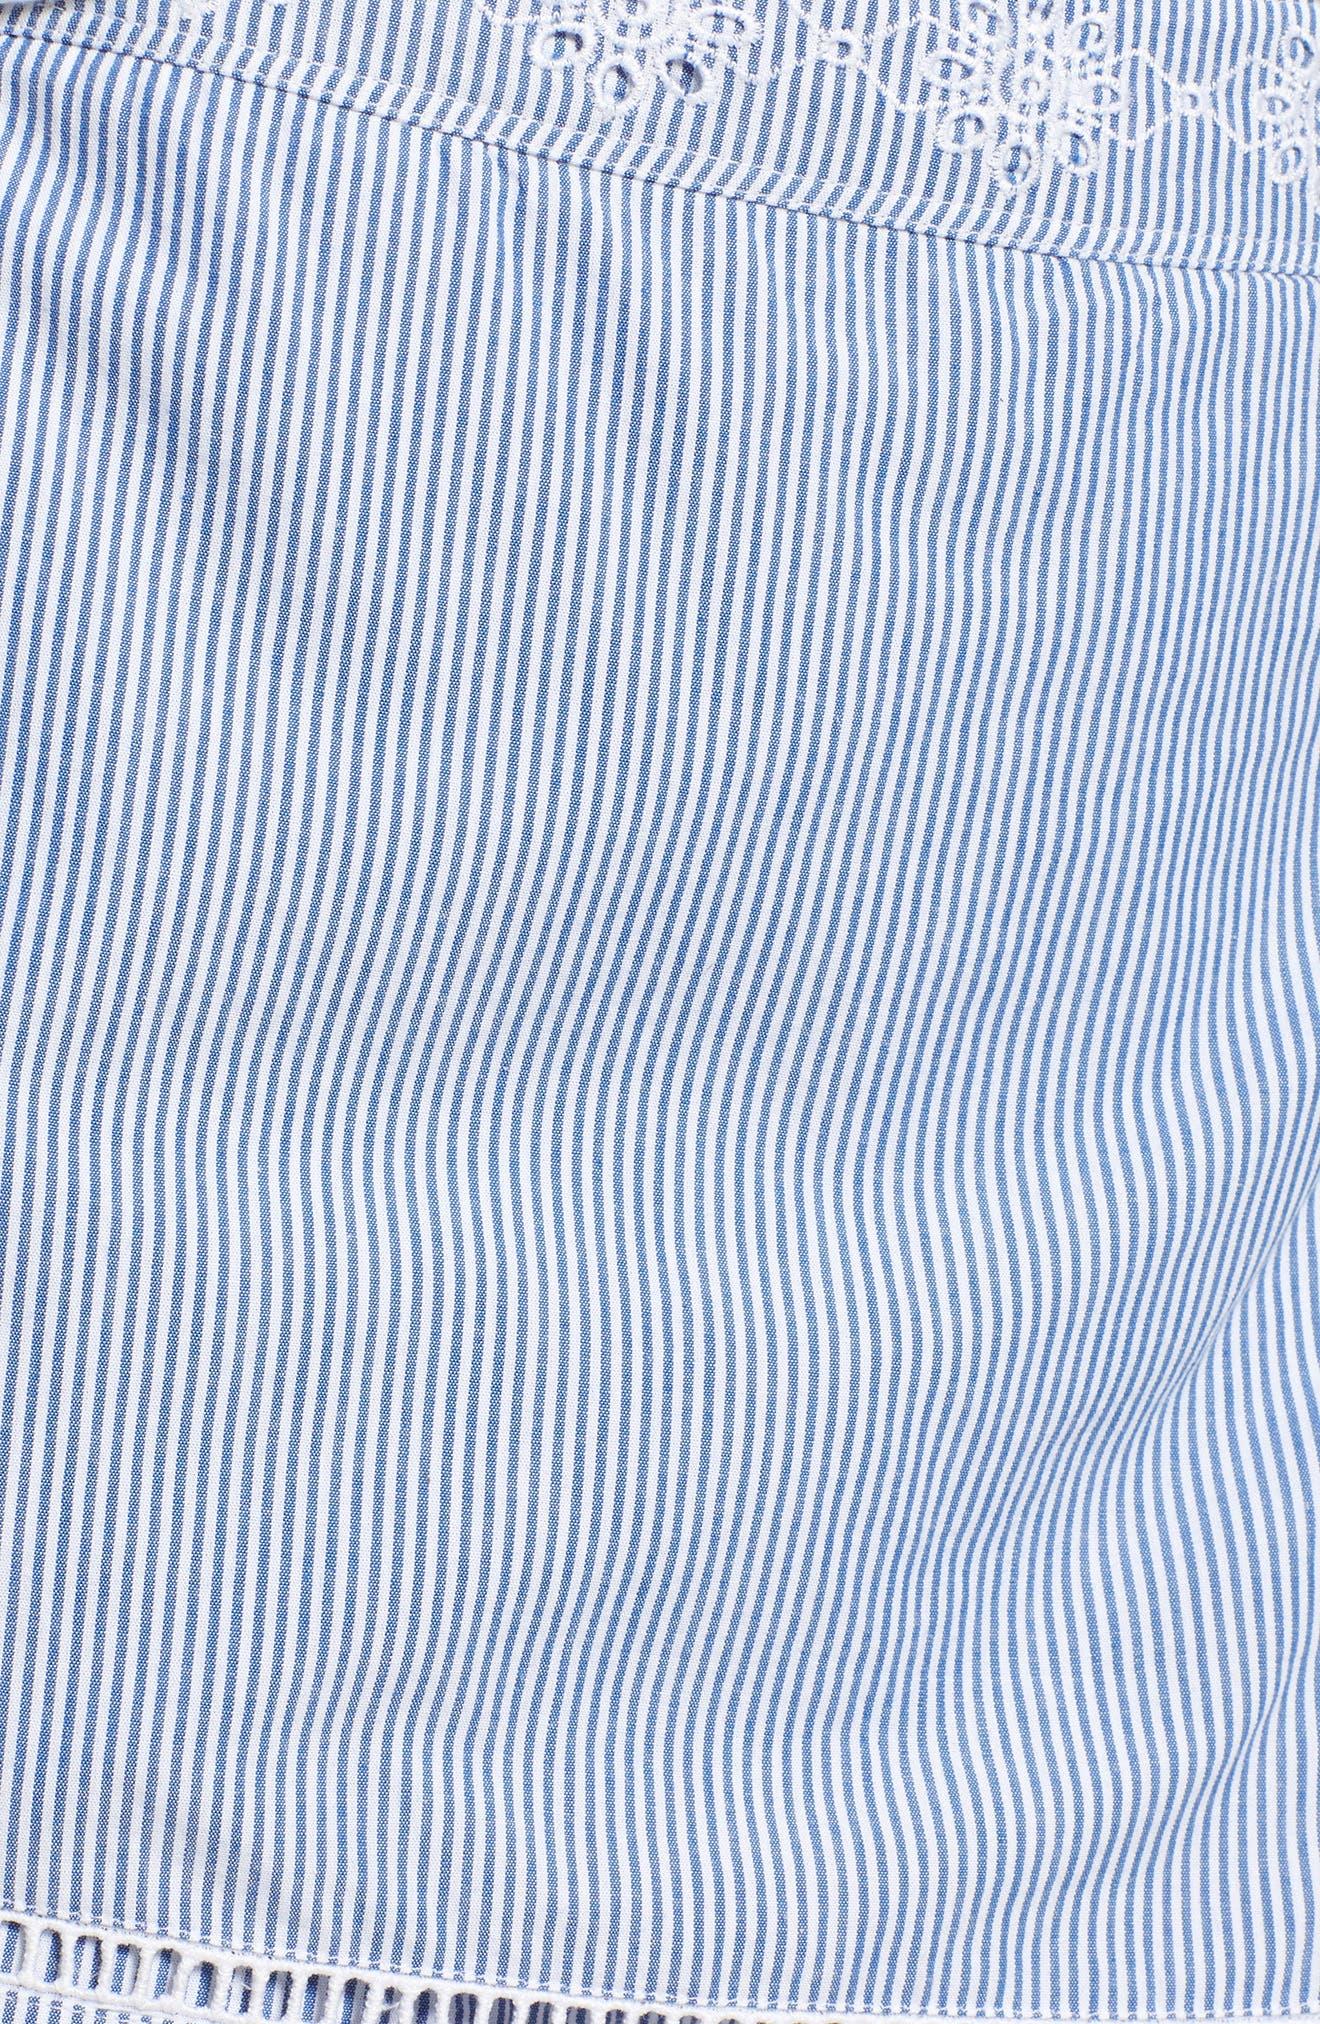 Sandbar Stripe Embroidered Skort,                             Alternate thumbnail 5, color,                             461